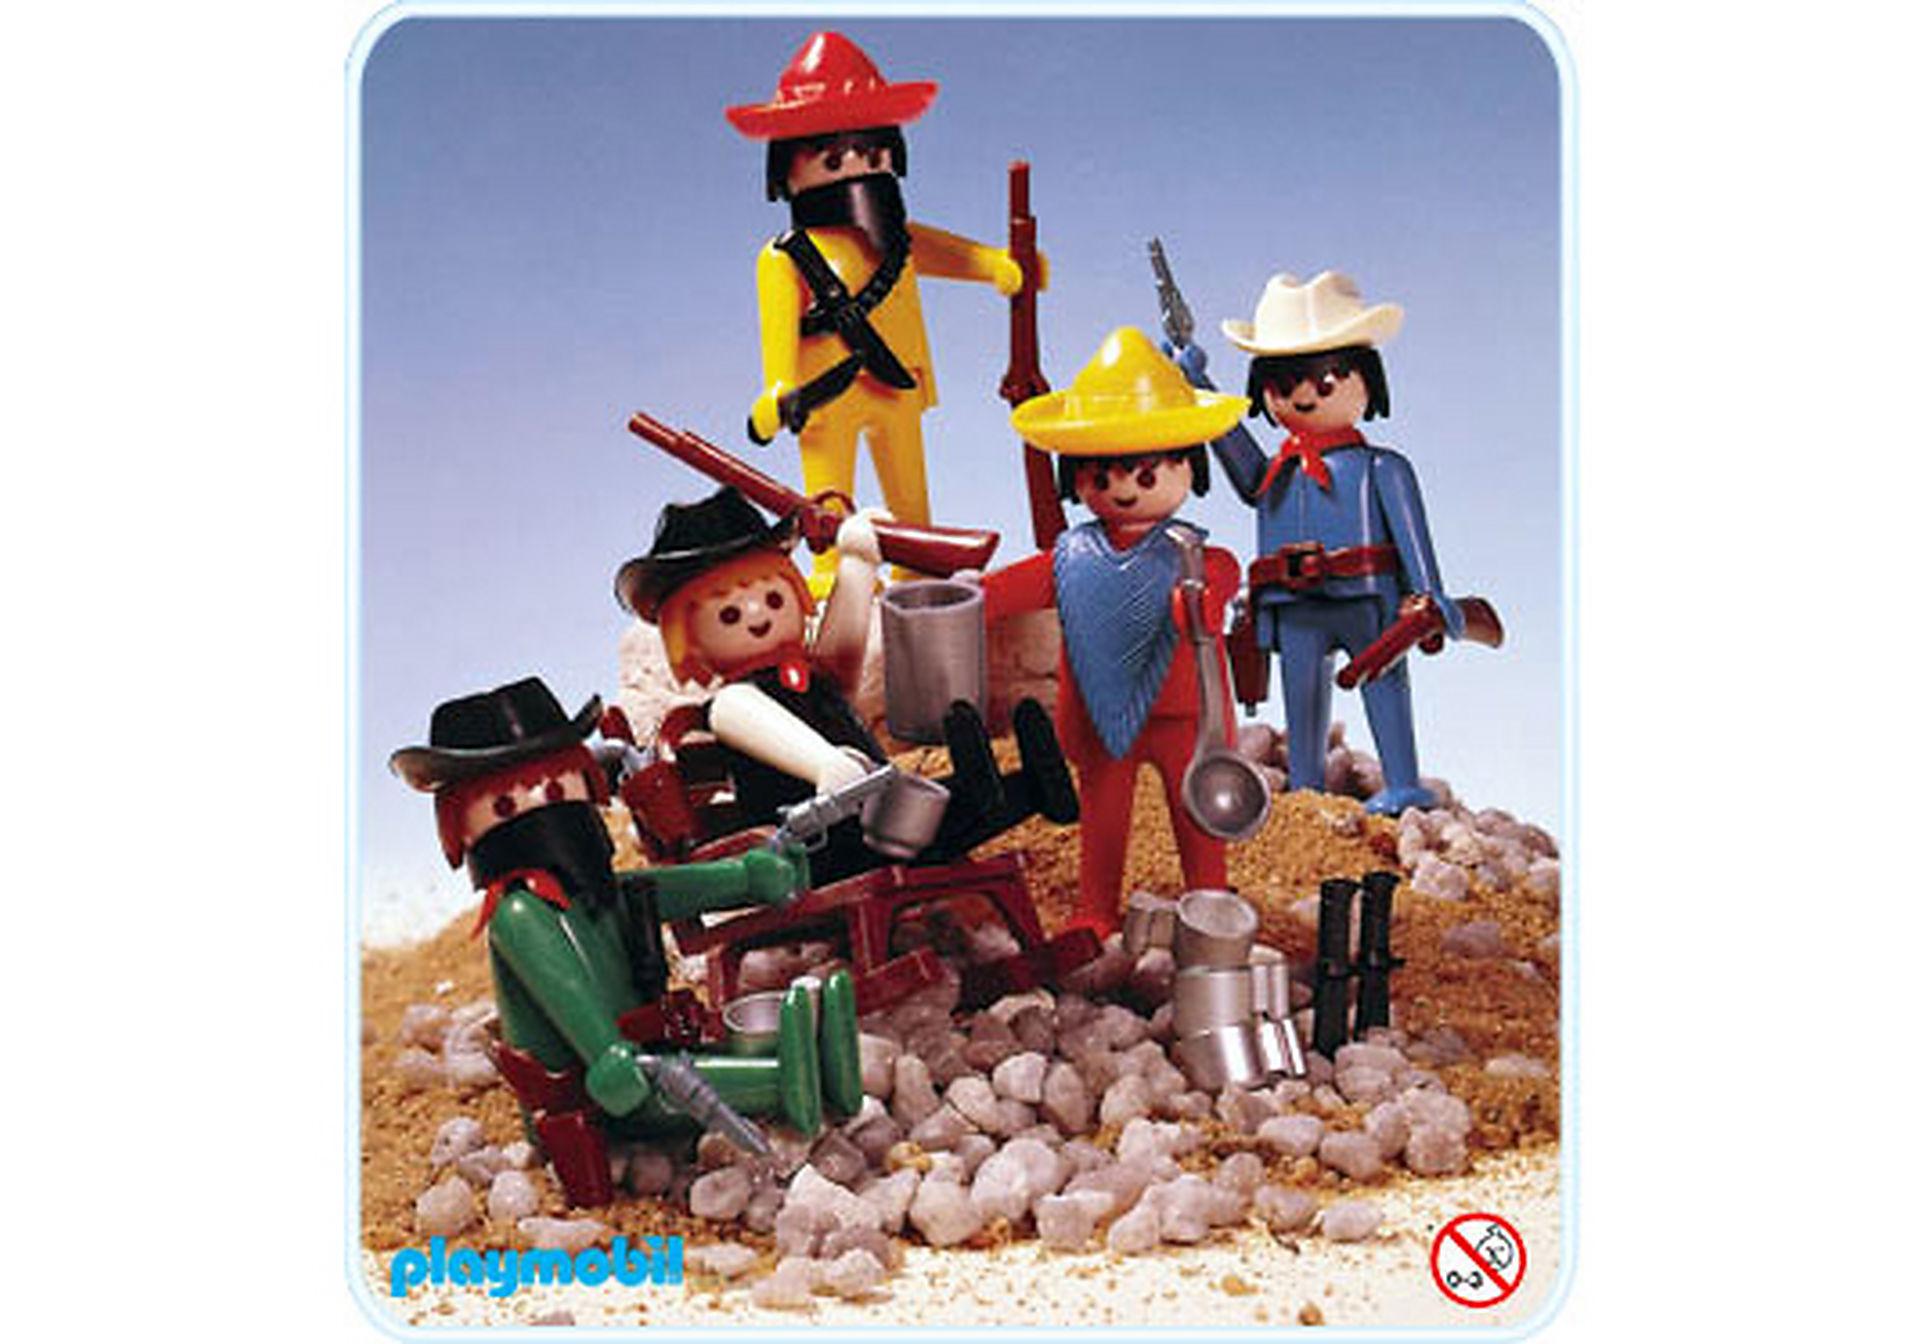 http://media.playmobil.com/i/playmobil/3241-B_product_detail/Cowboy/Mexikaner-Set